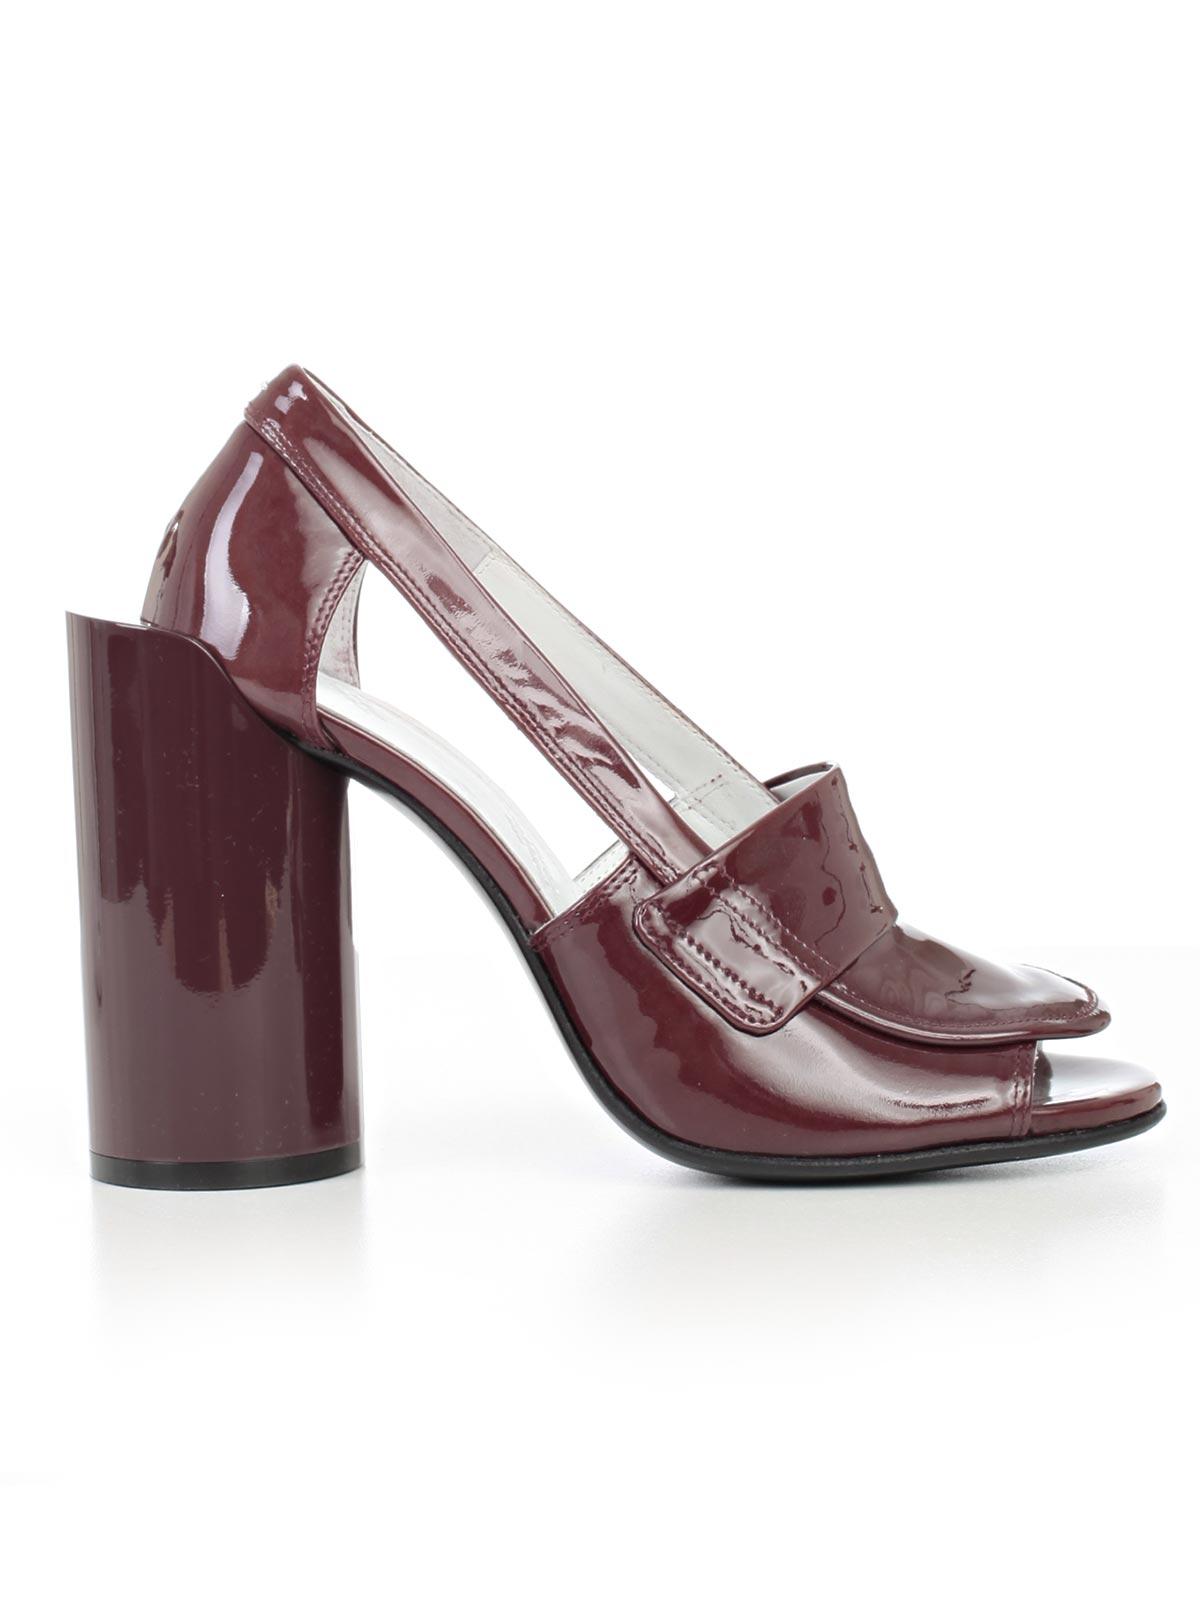 Picture of MAISON MARGIELA Footwear